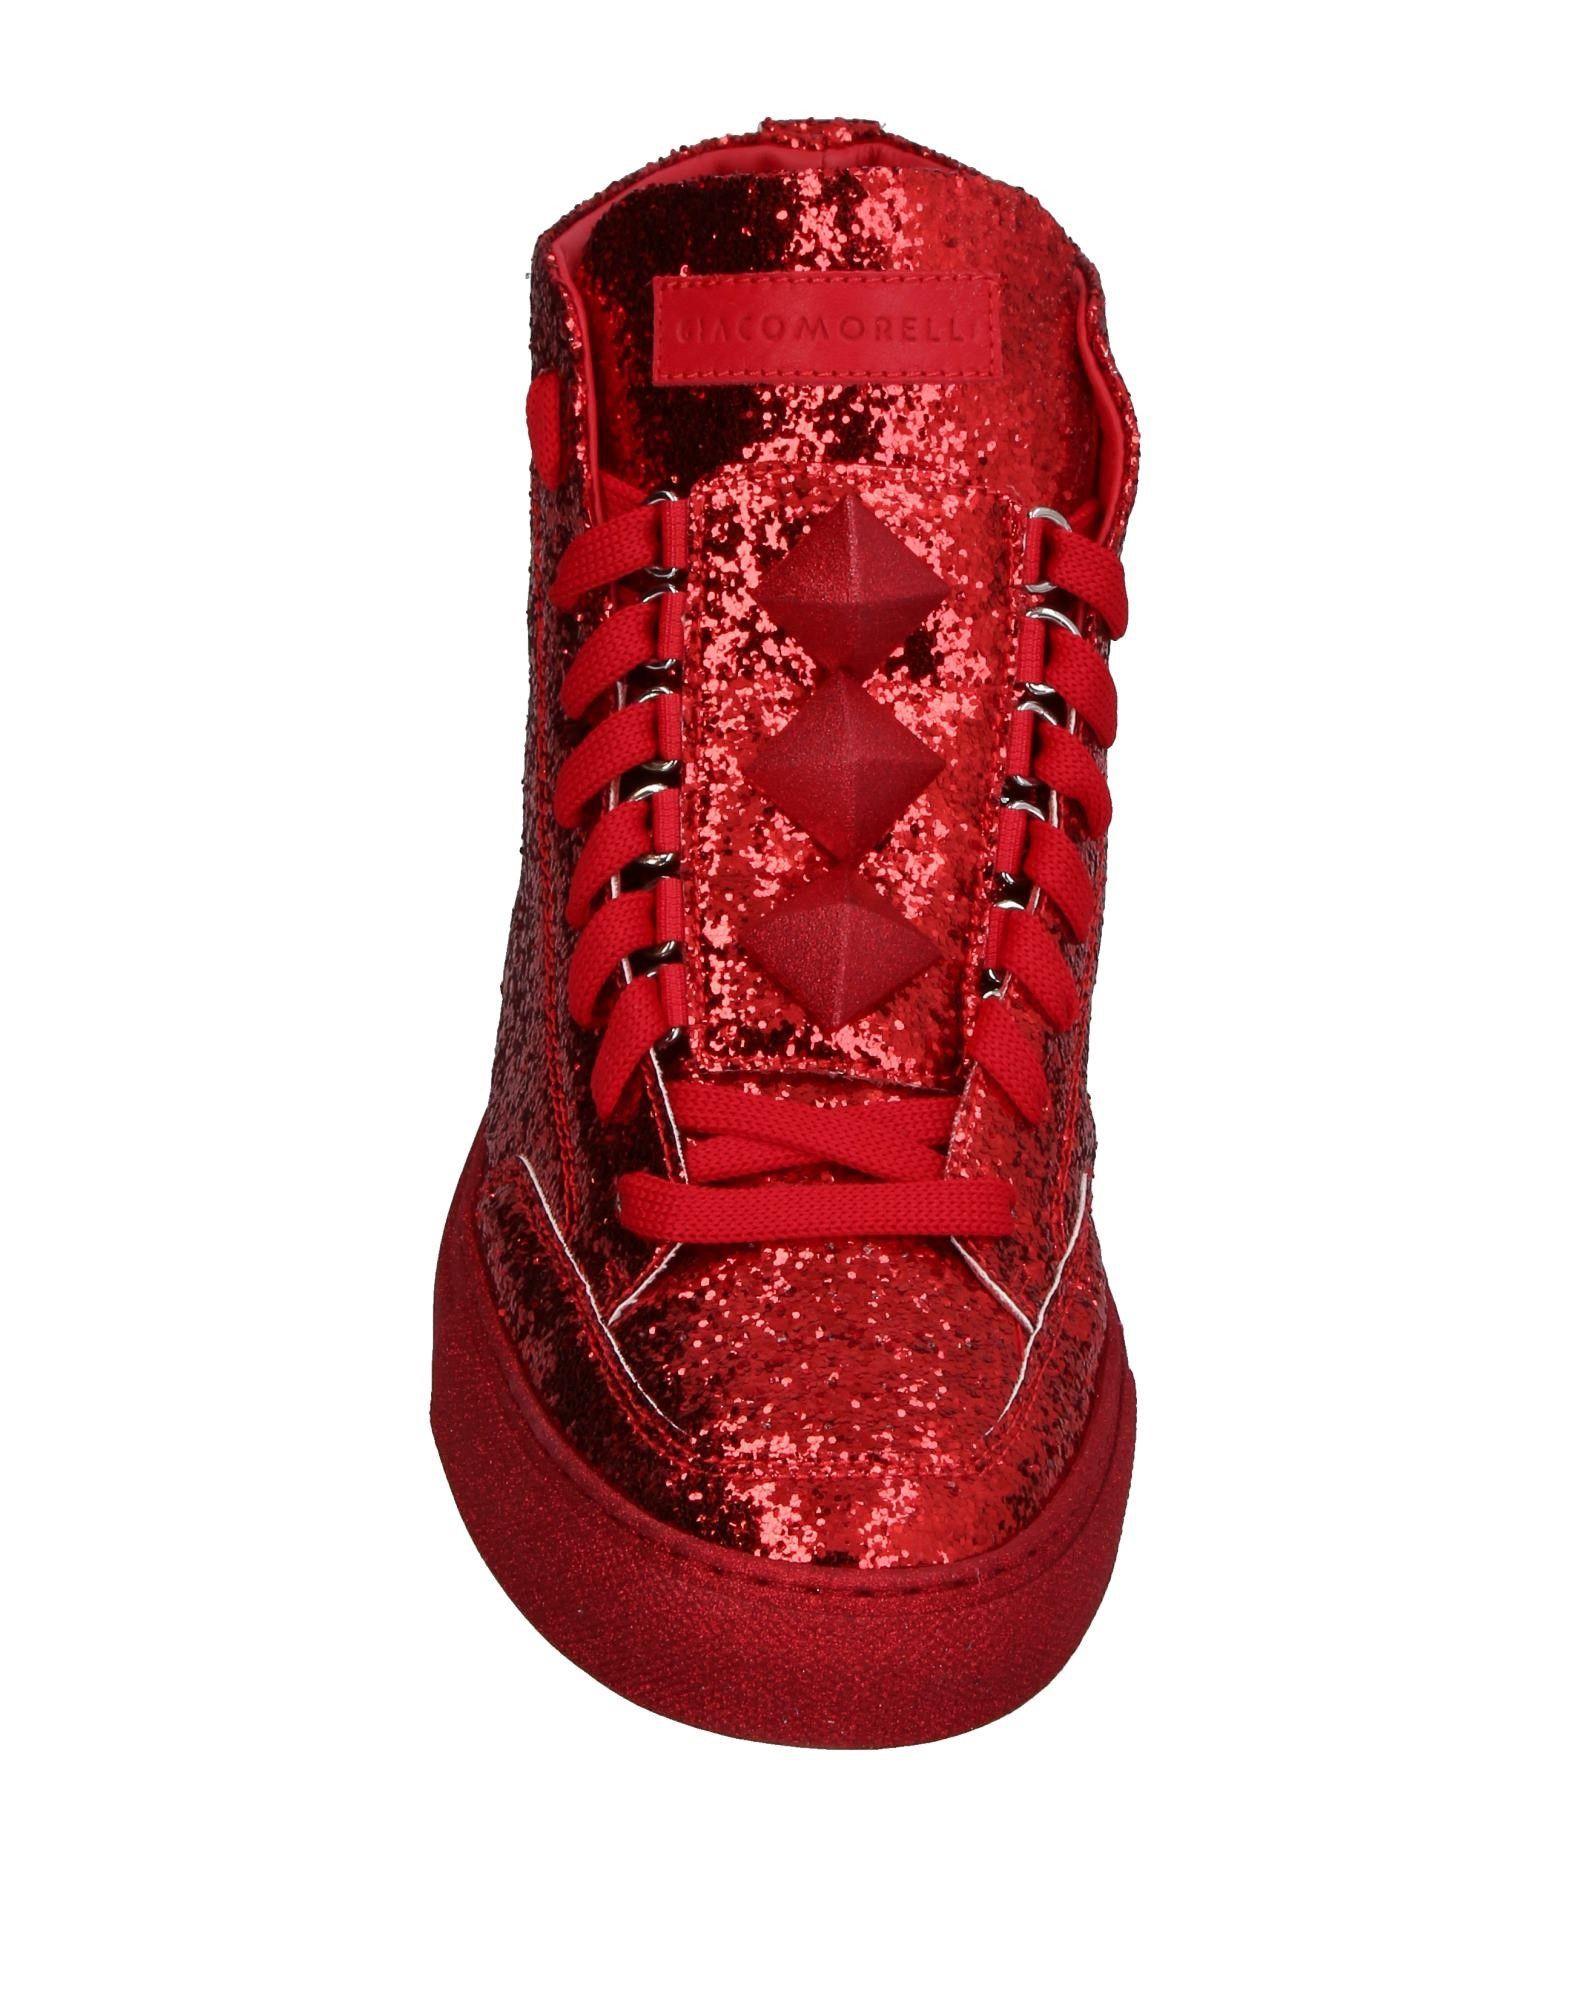 Giacomorelli Sneakers Herren  11386551BN Gute Qualität beliebte Schuhe